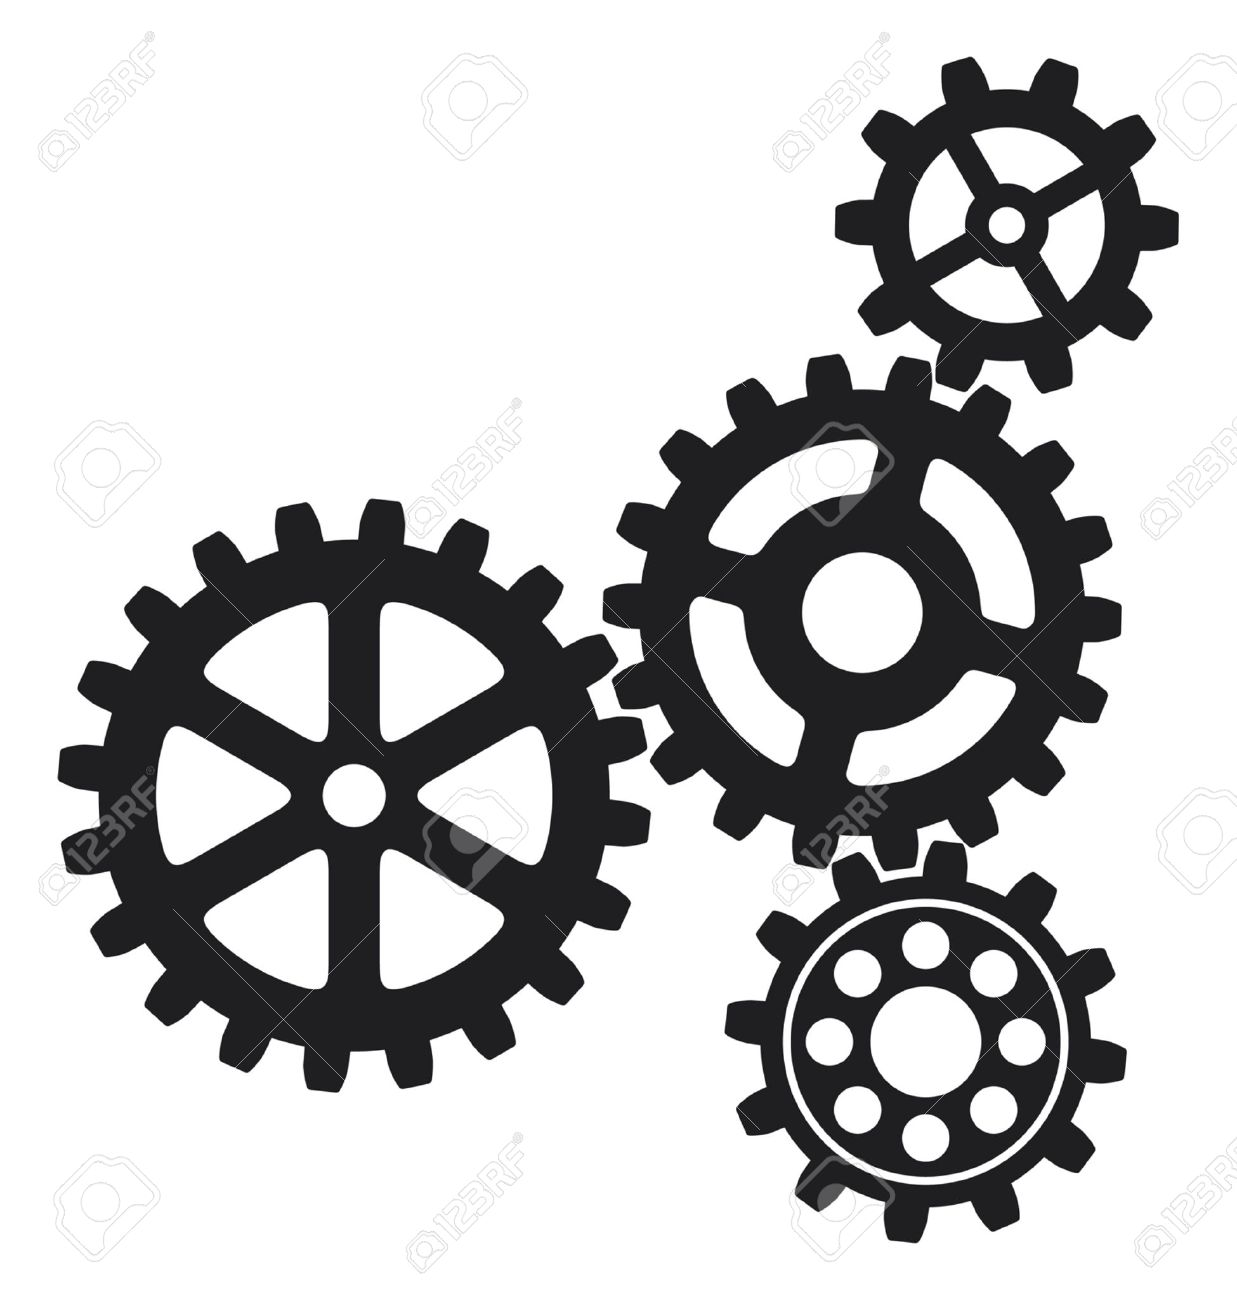 growing gears gear icon gears icon royalty free cliparts vectors